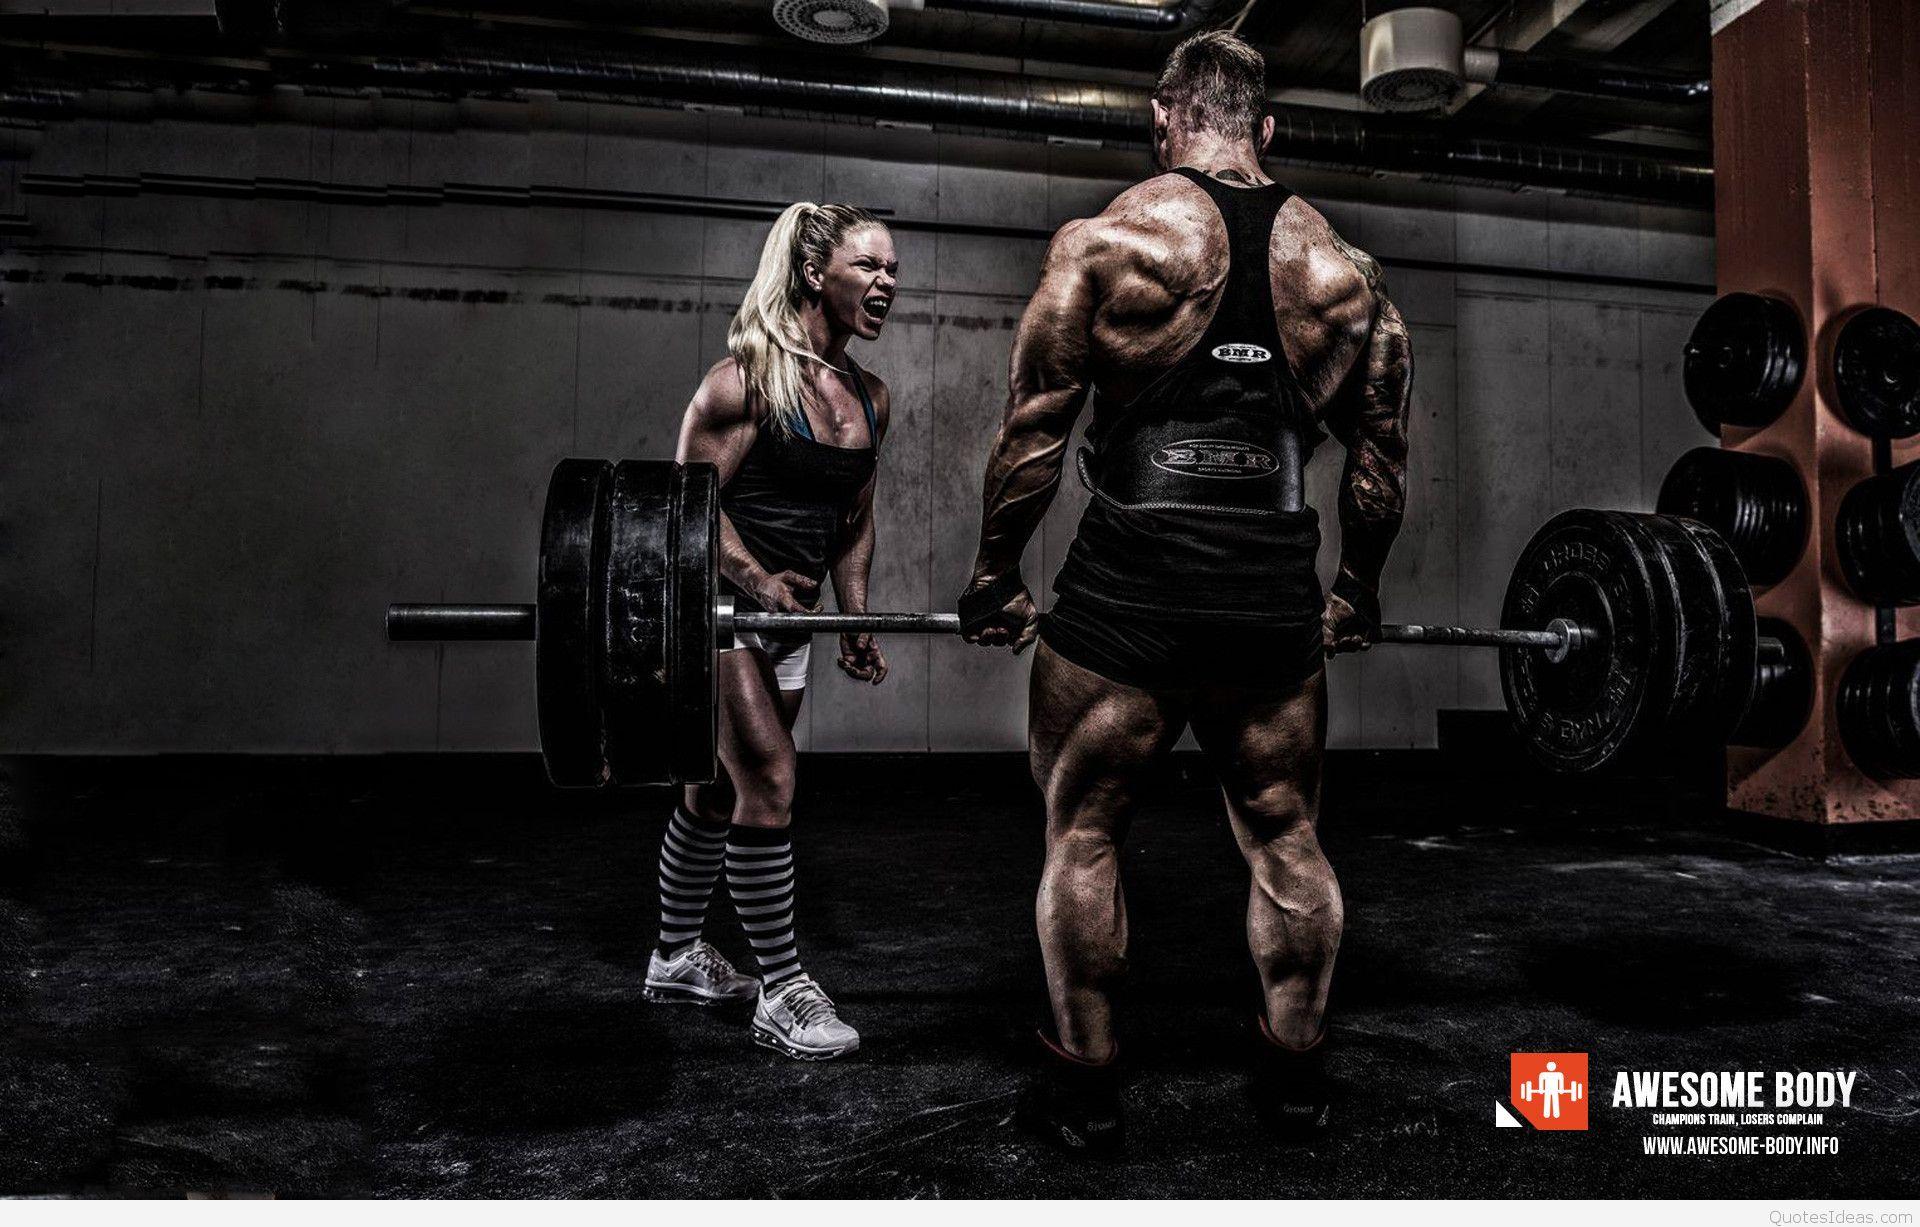 gym inspiration - 1039×649